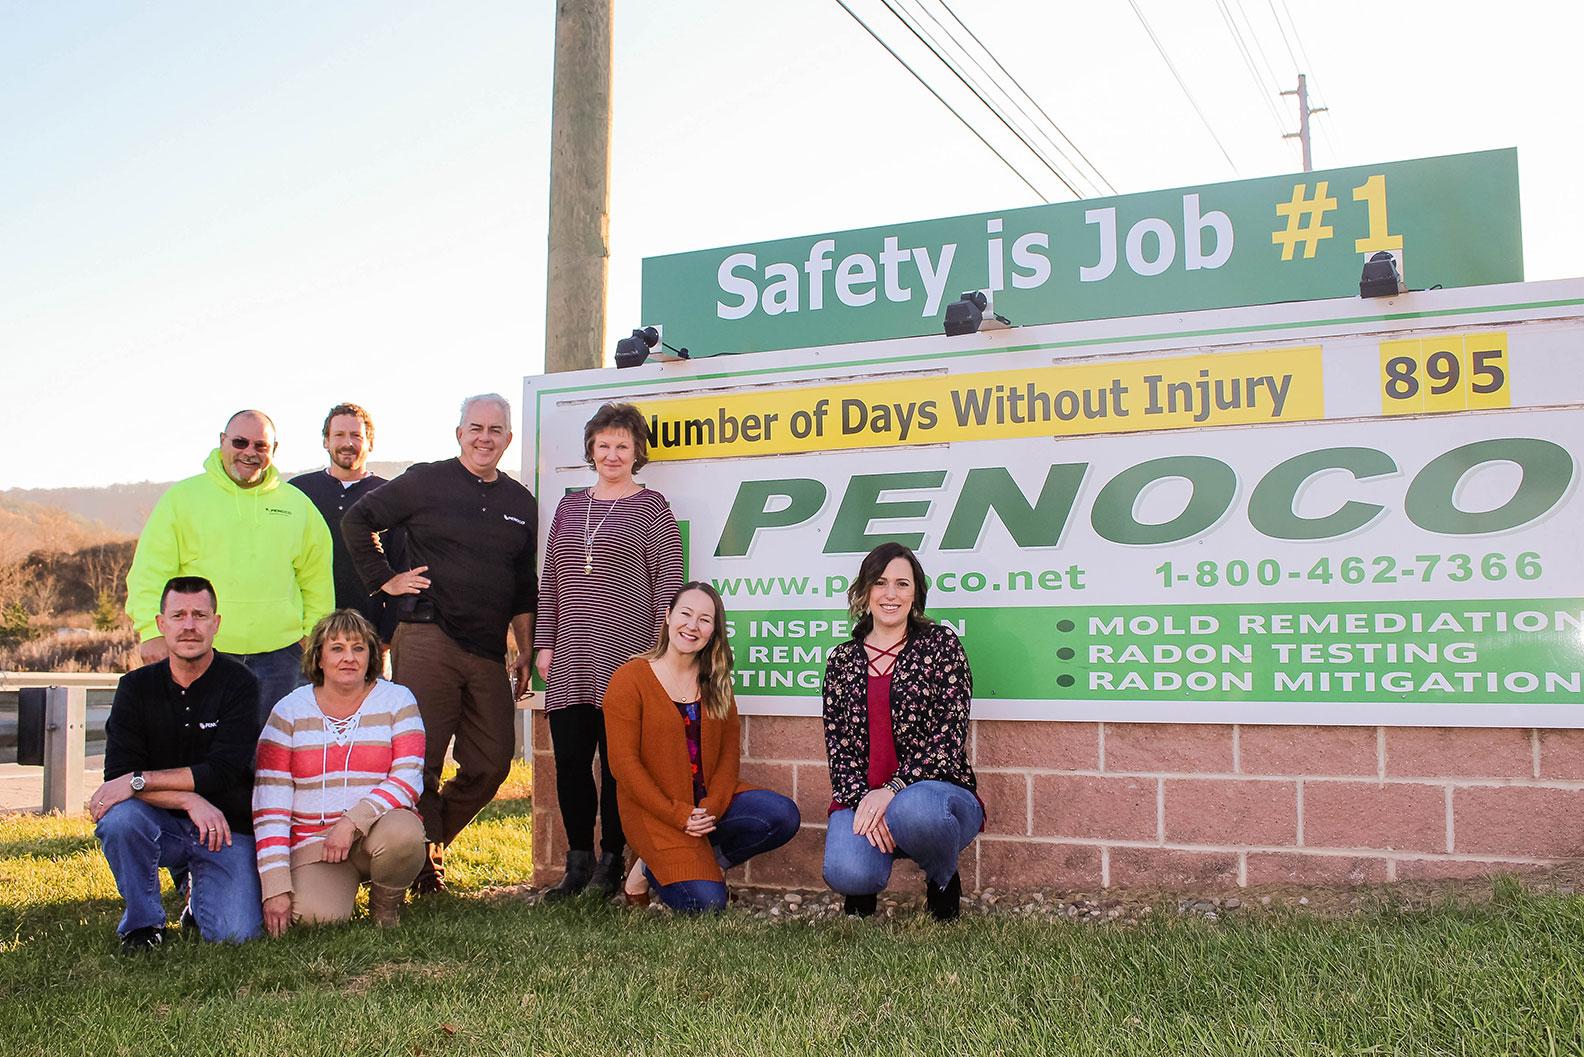 Employment Application Penoco Inc